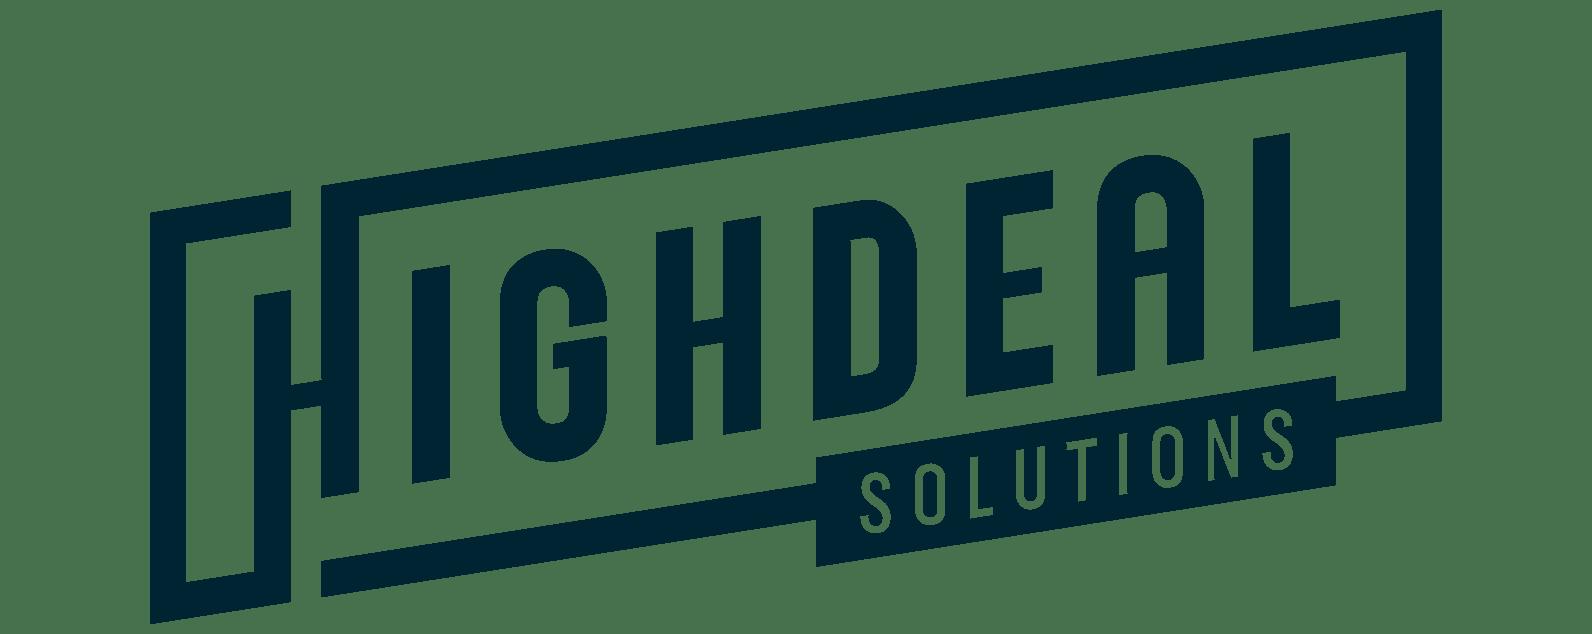 Y5 Creative Case Studies Logo Highdeal Solutions